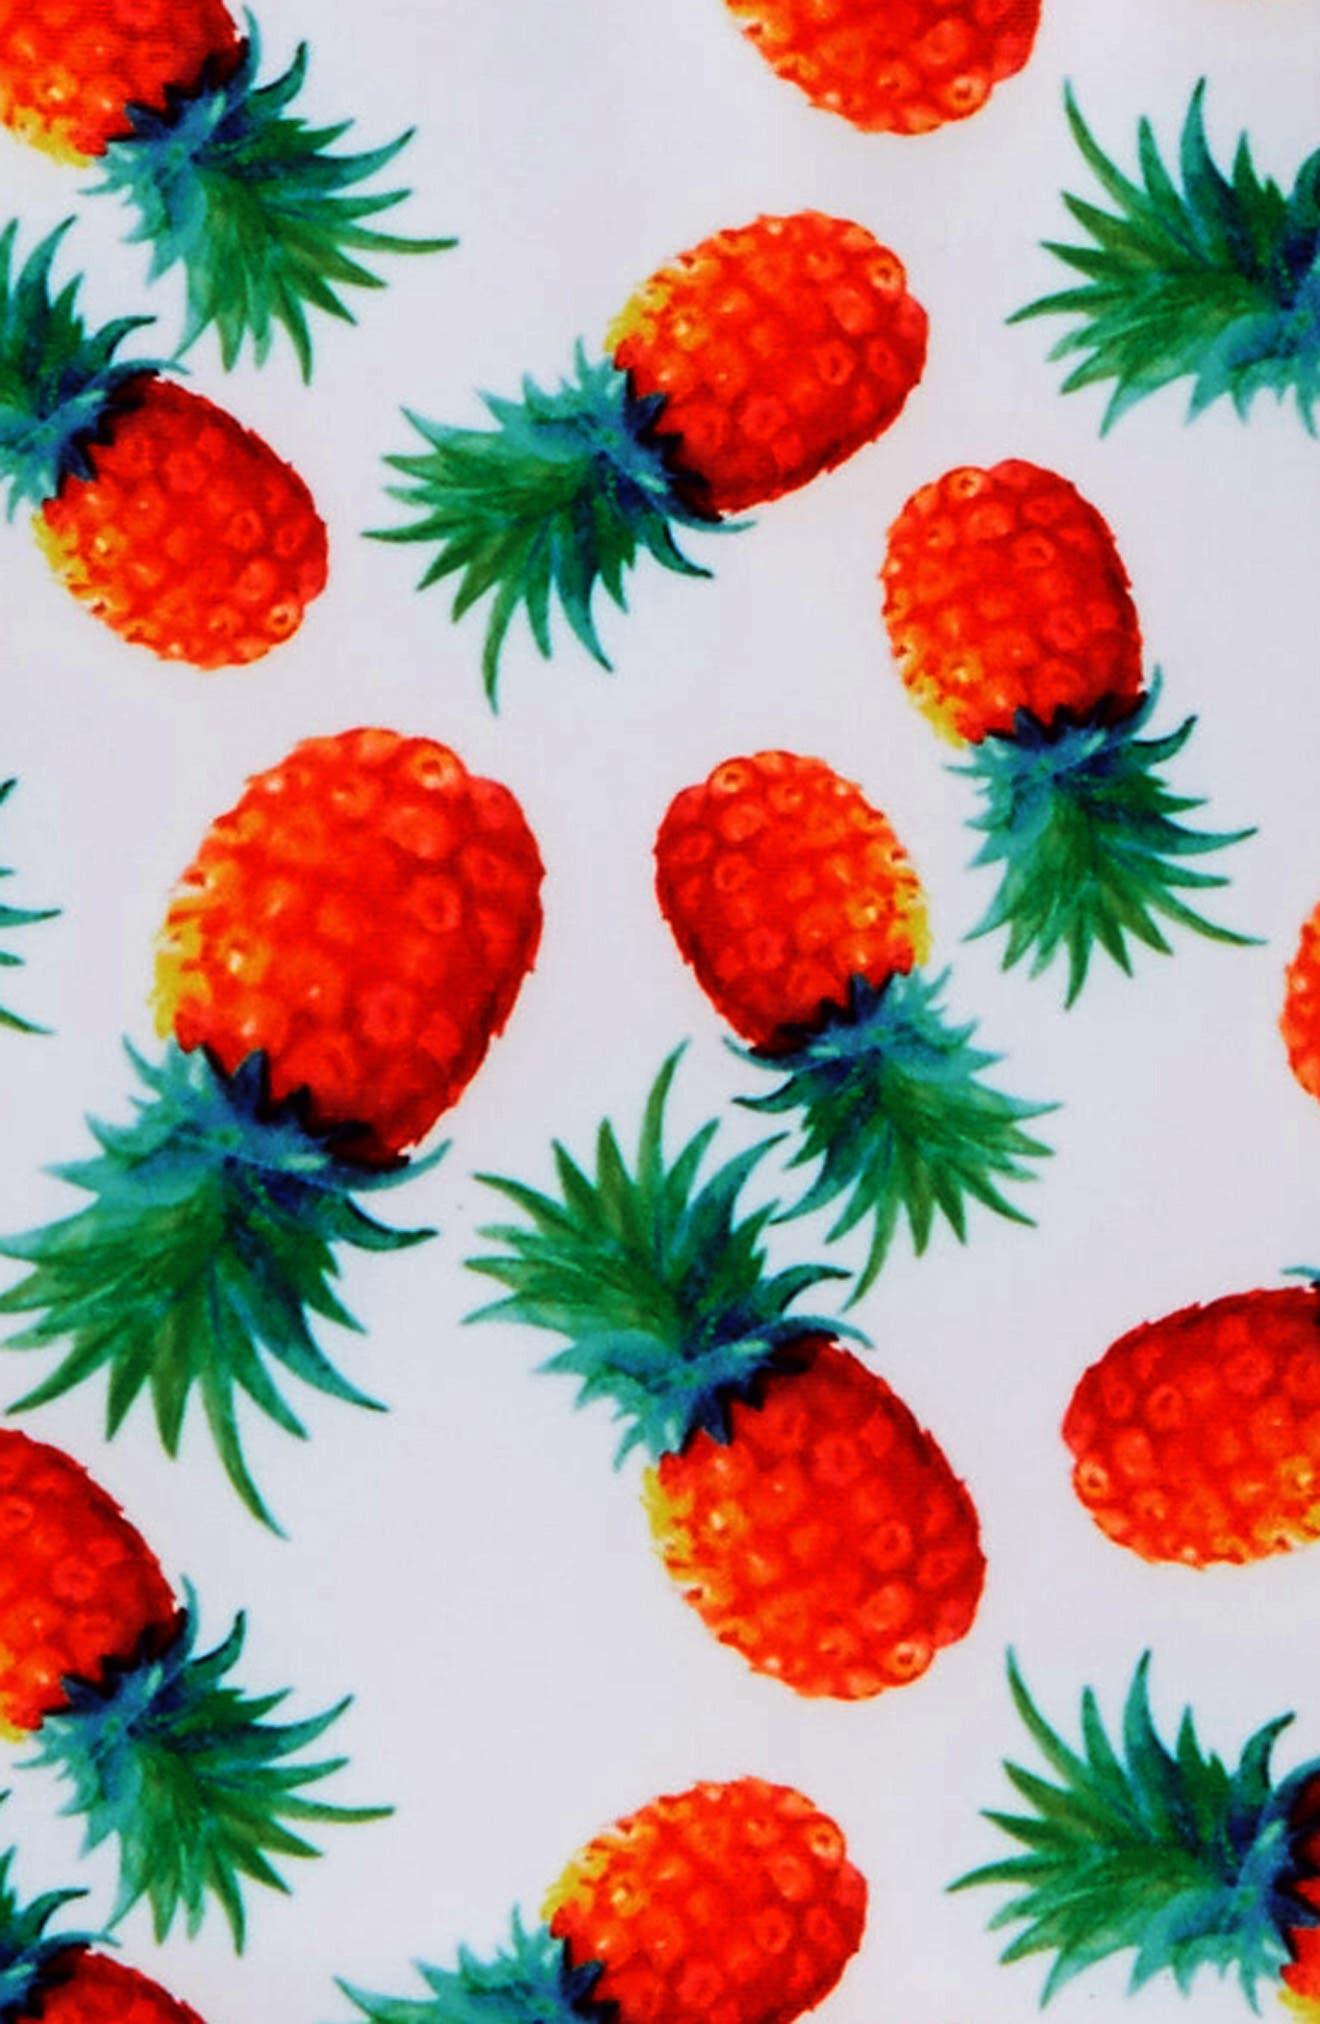 Pineapple Disco Two-Piece Rashguard Swimsuit,                             Alternate thumbnail 2, color,                             White Multi